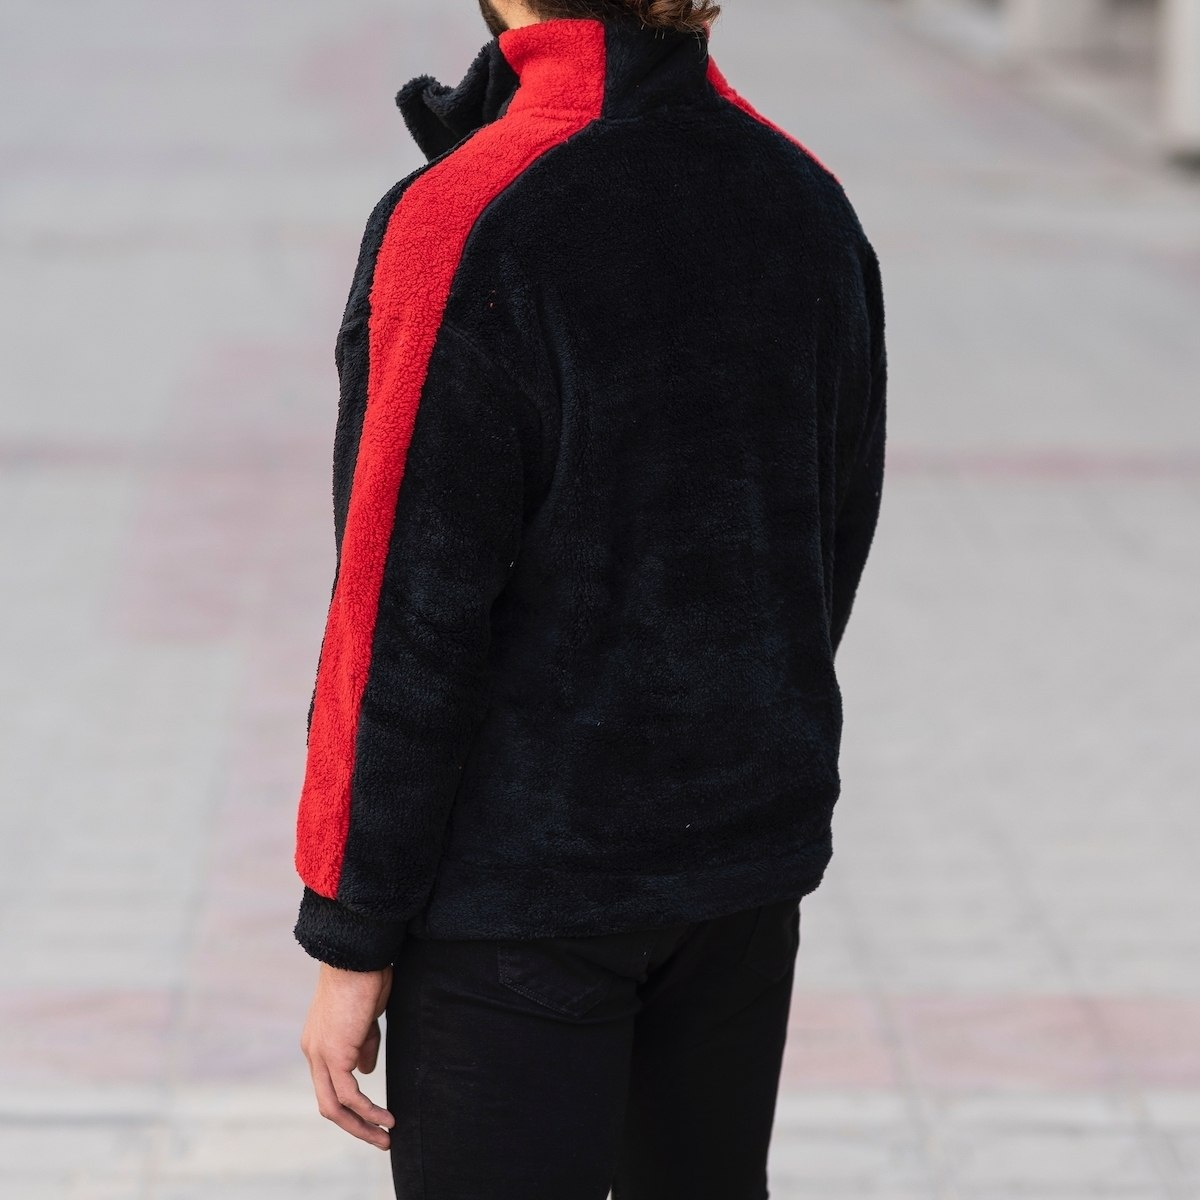 Well-Soft SweatShirt in Black&Red Mv Premium Brand - 6